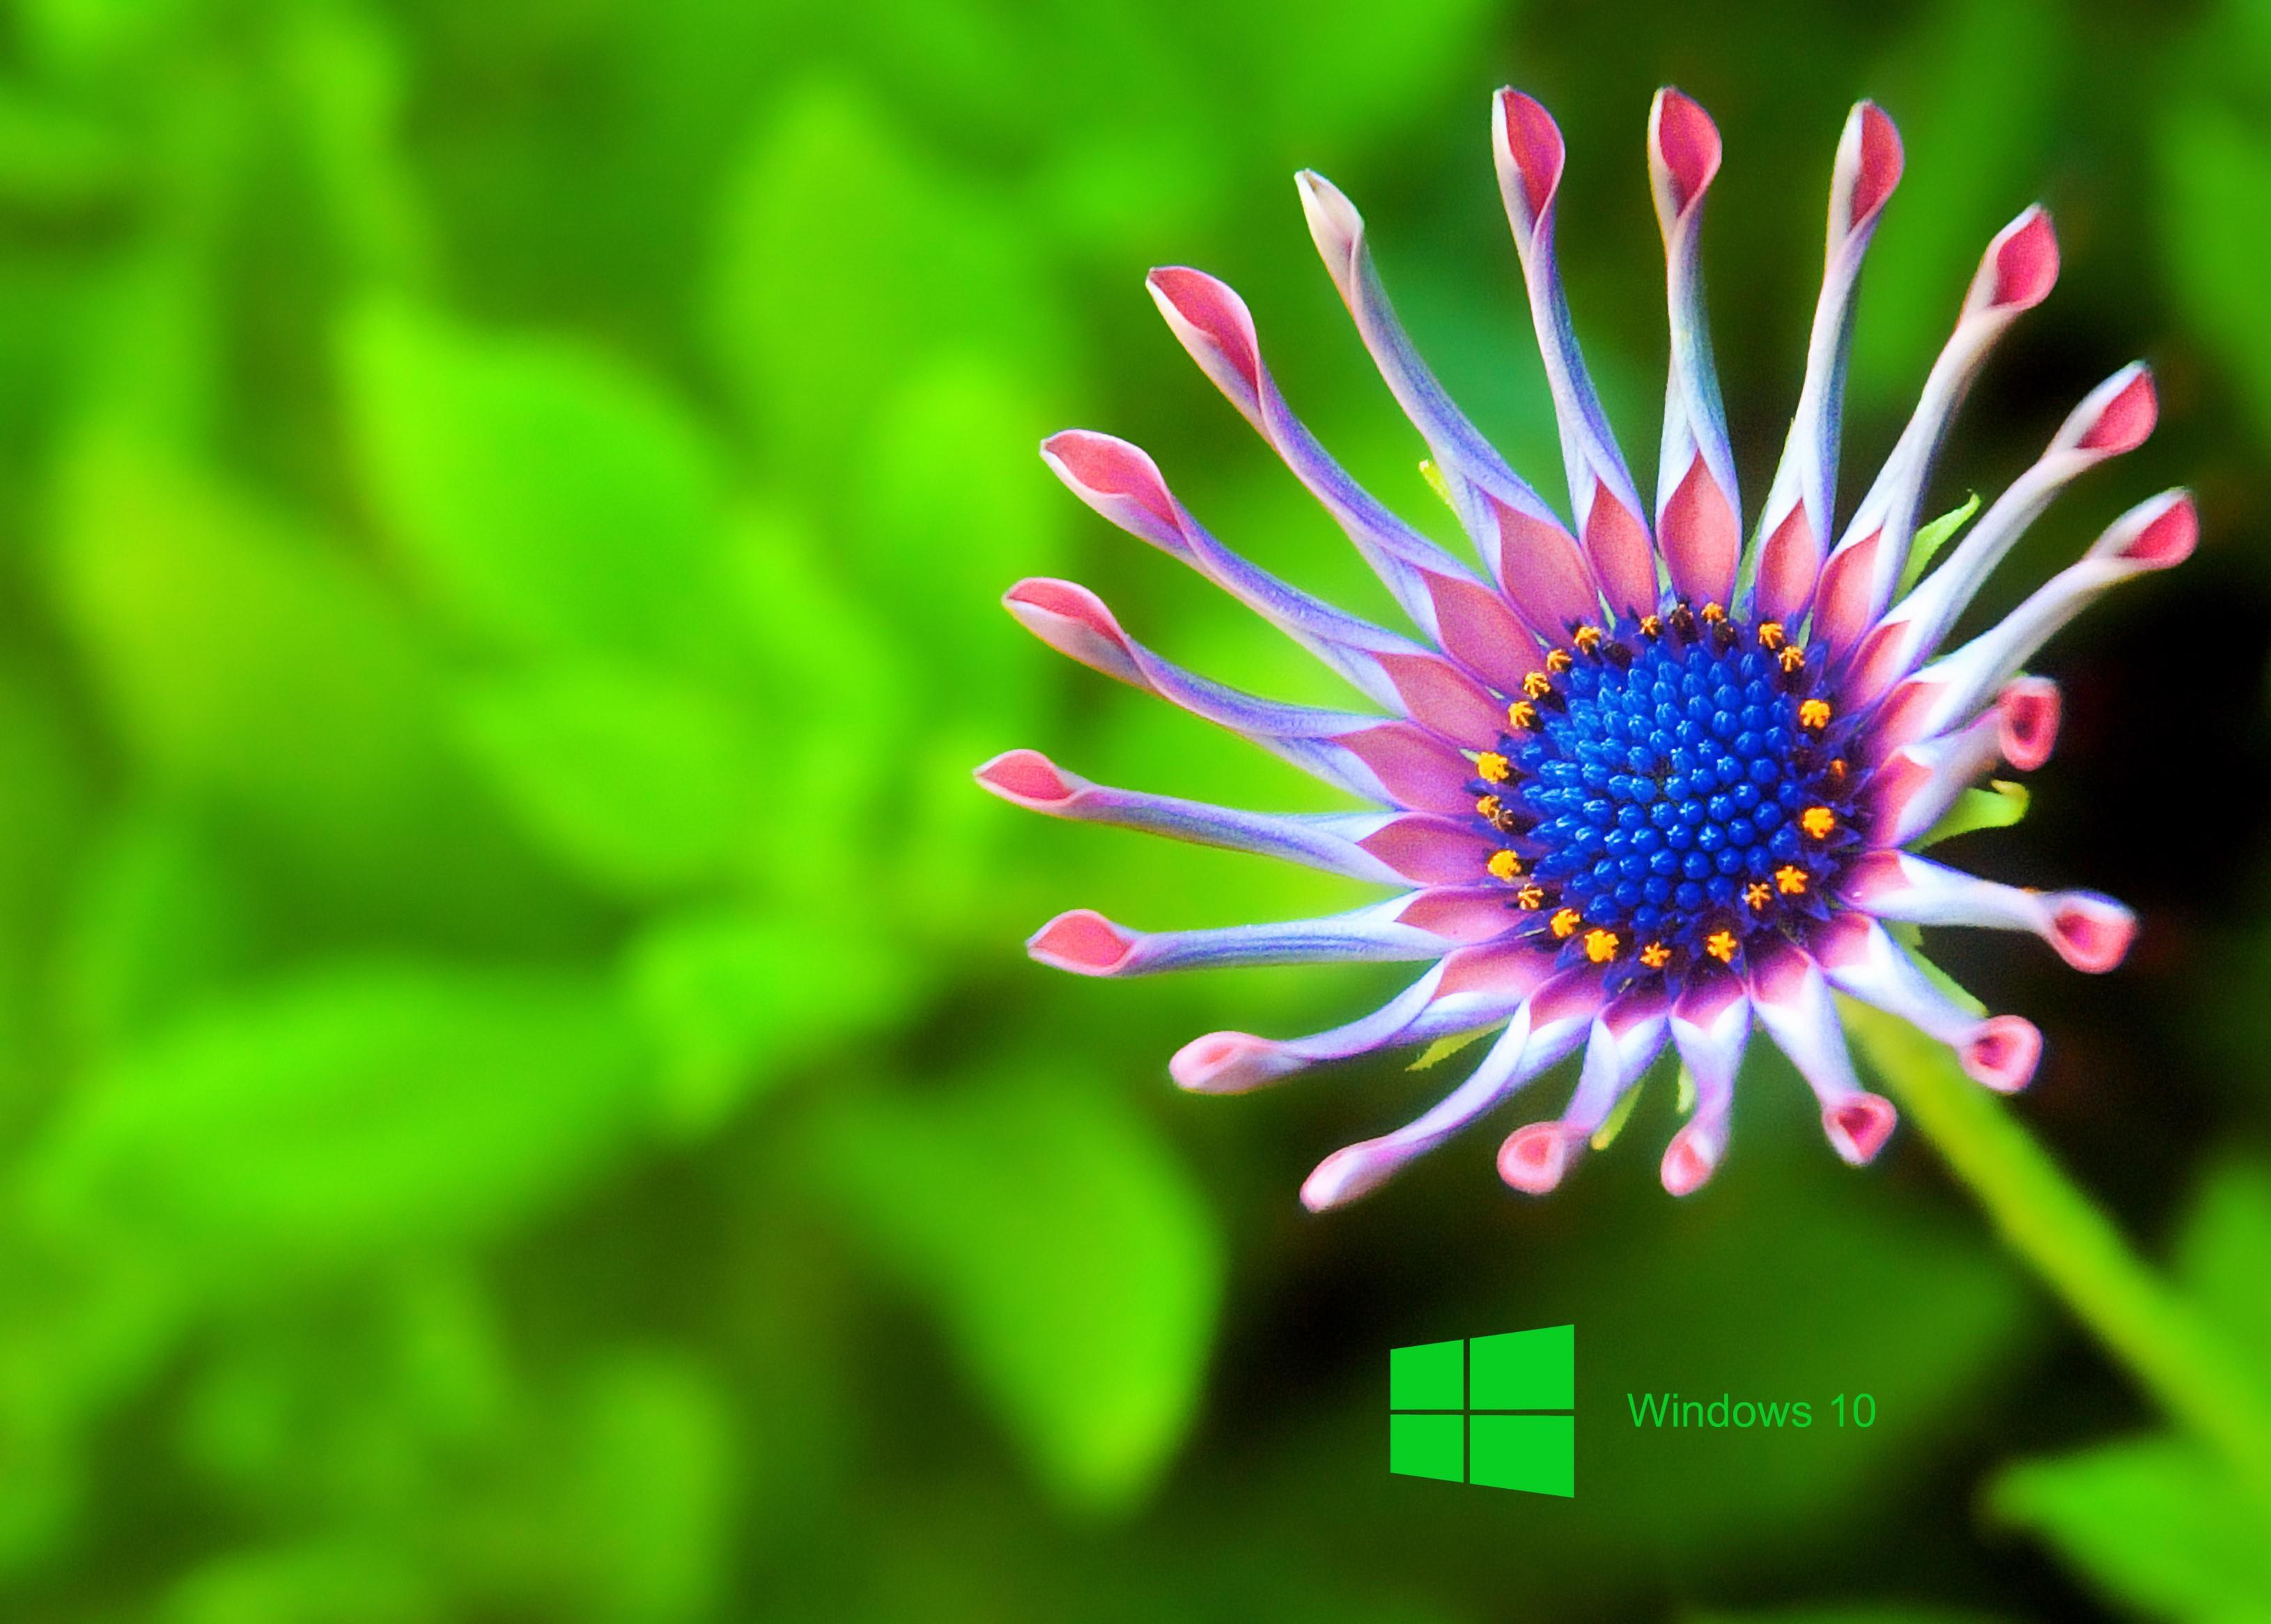 windows 10 wallpaper hd,green,flower,close up,petal,plant